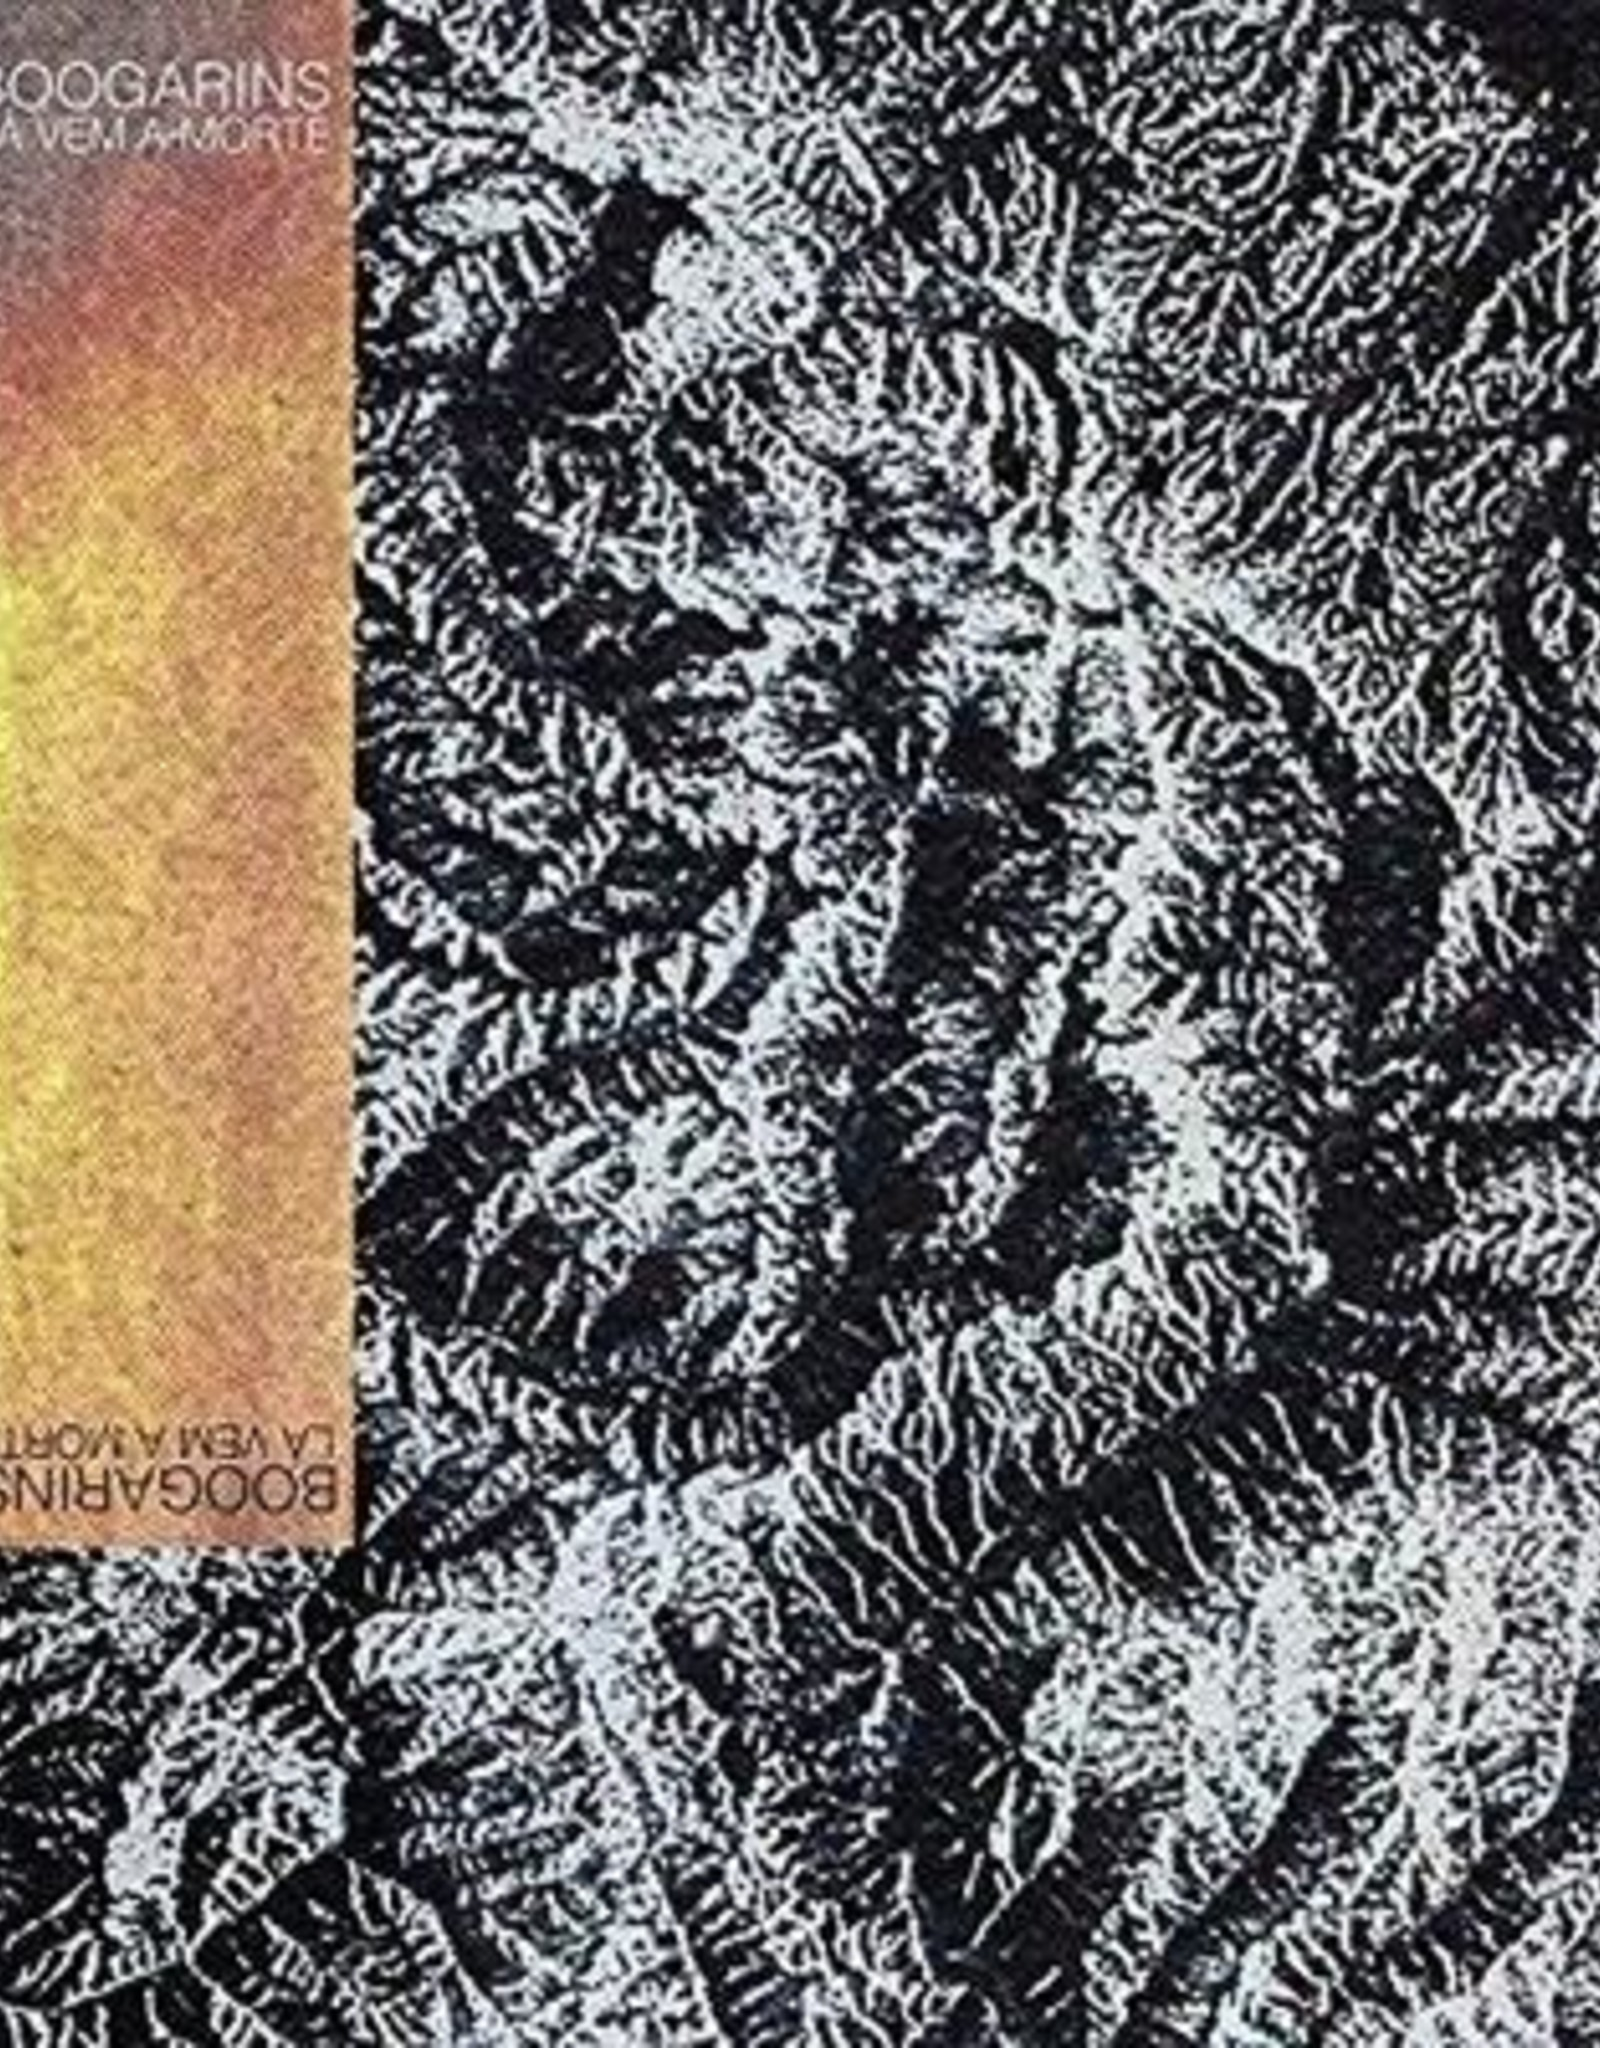 Boogarins - Lá Vem A Morte (Limited Edition, Smoke Color Vinyl, 180Gram)